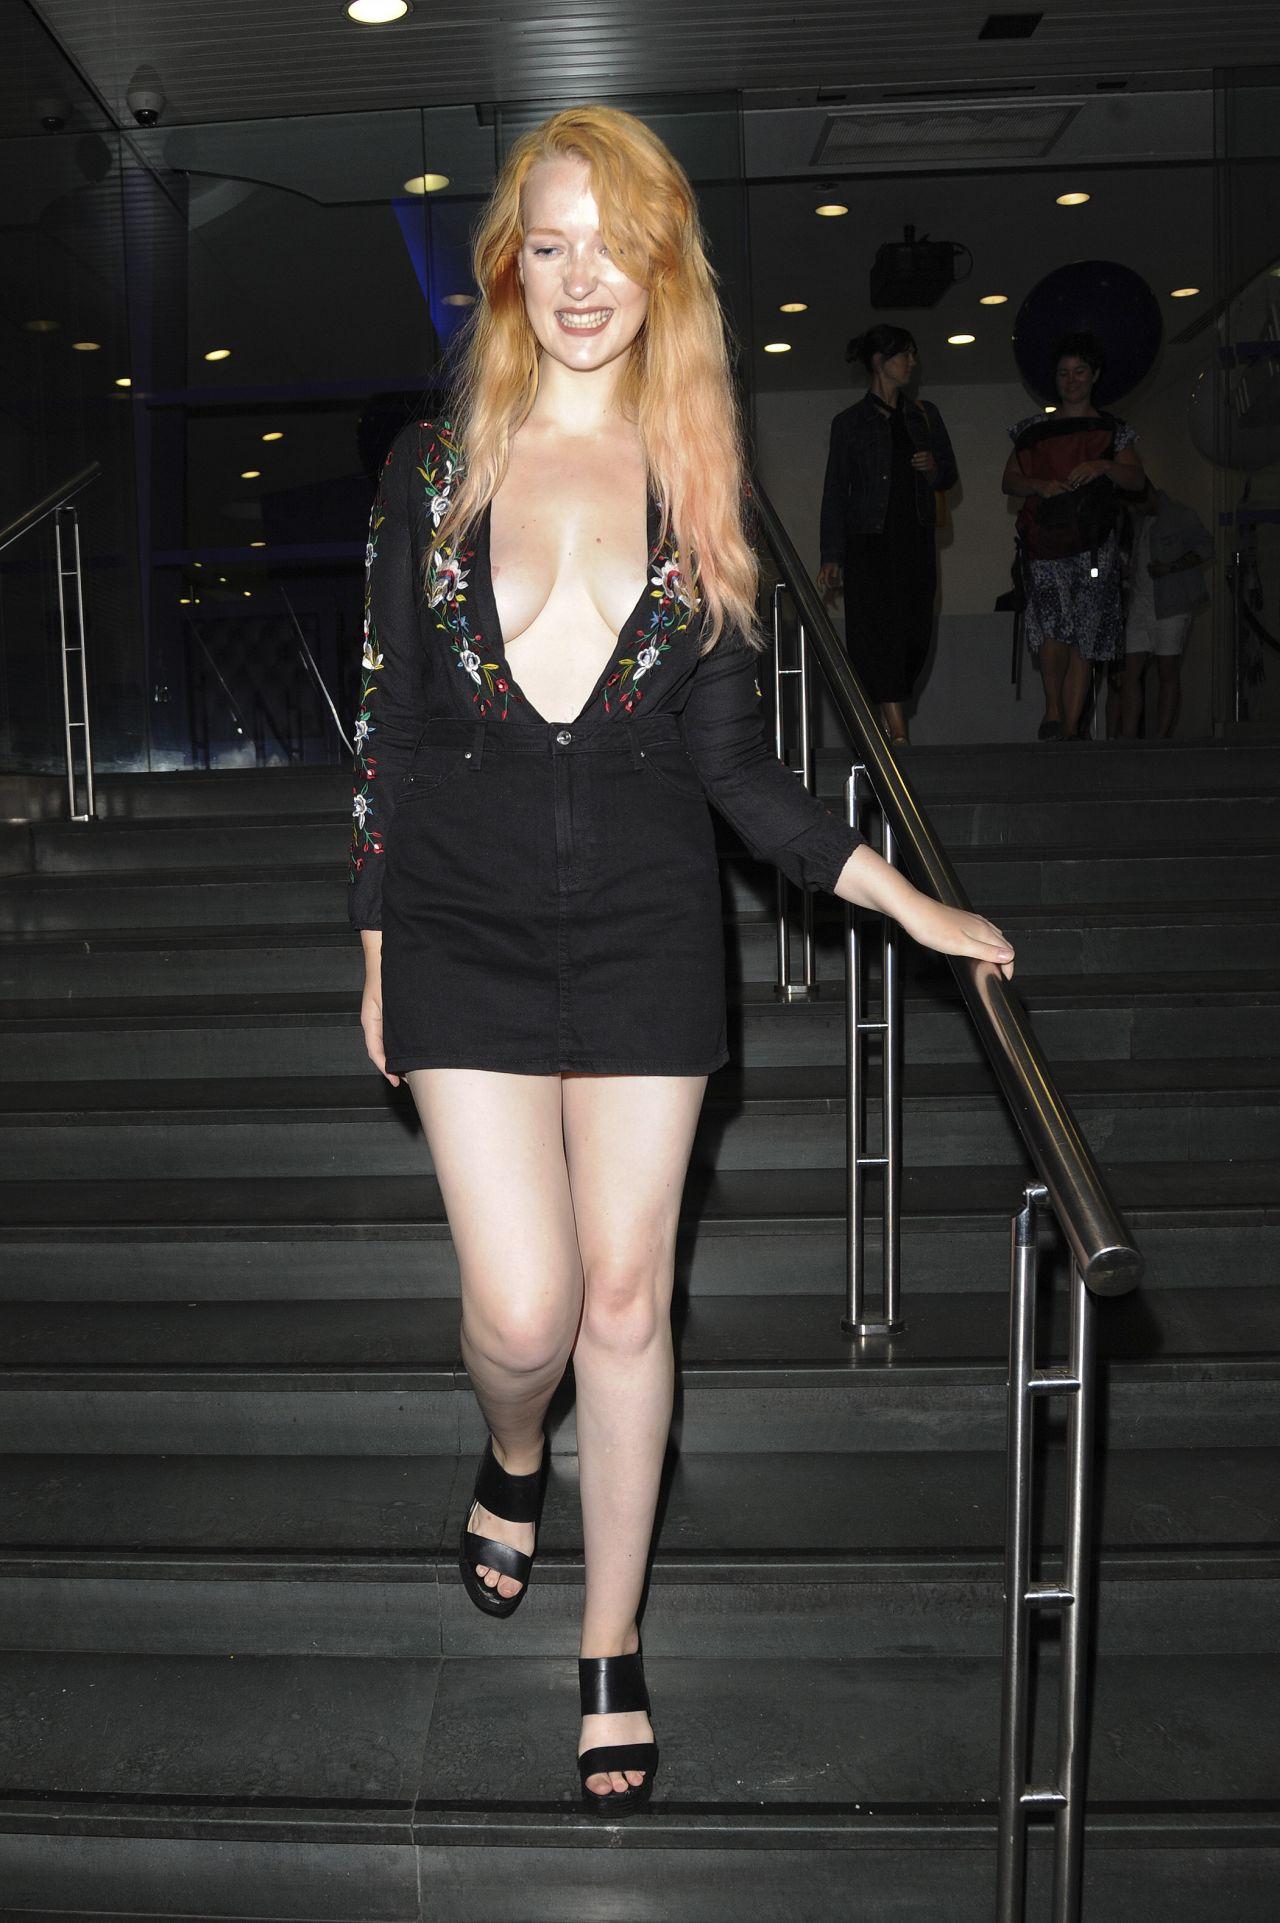 Boobs Legs Victoria Wicks  naked (44 images), Instagram, legs